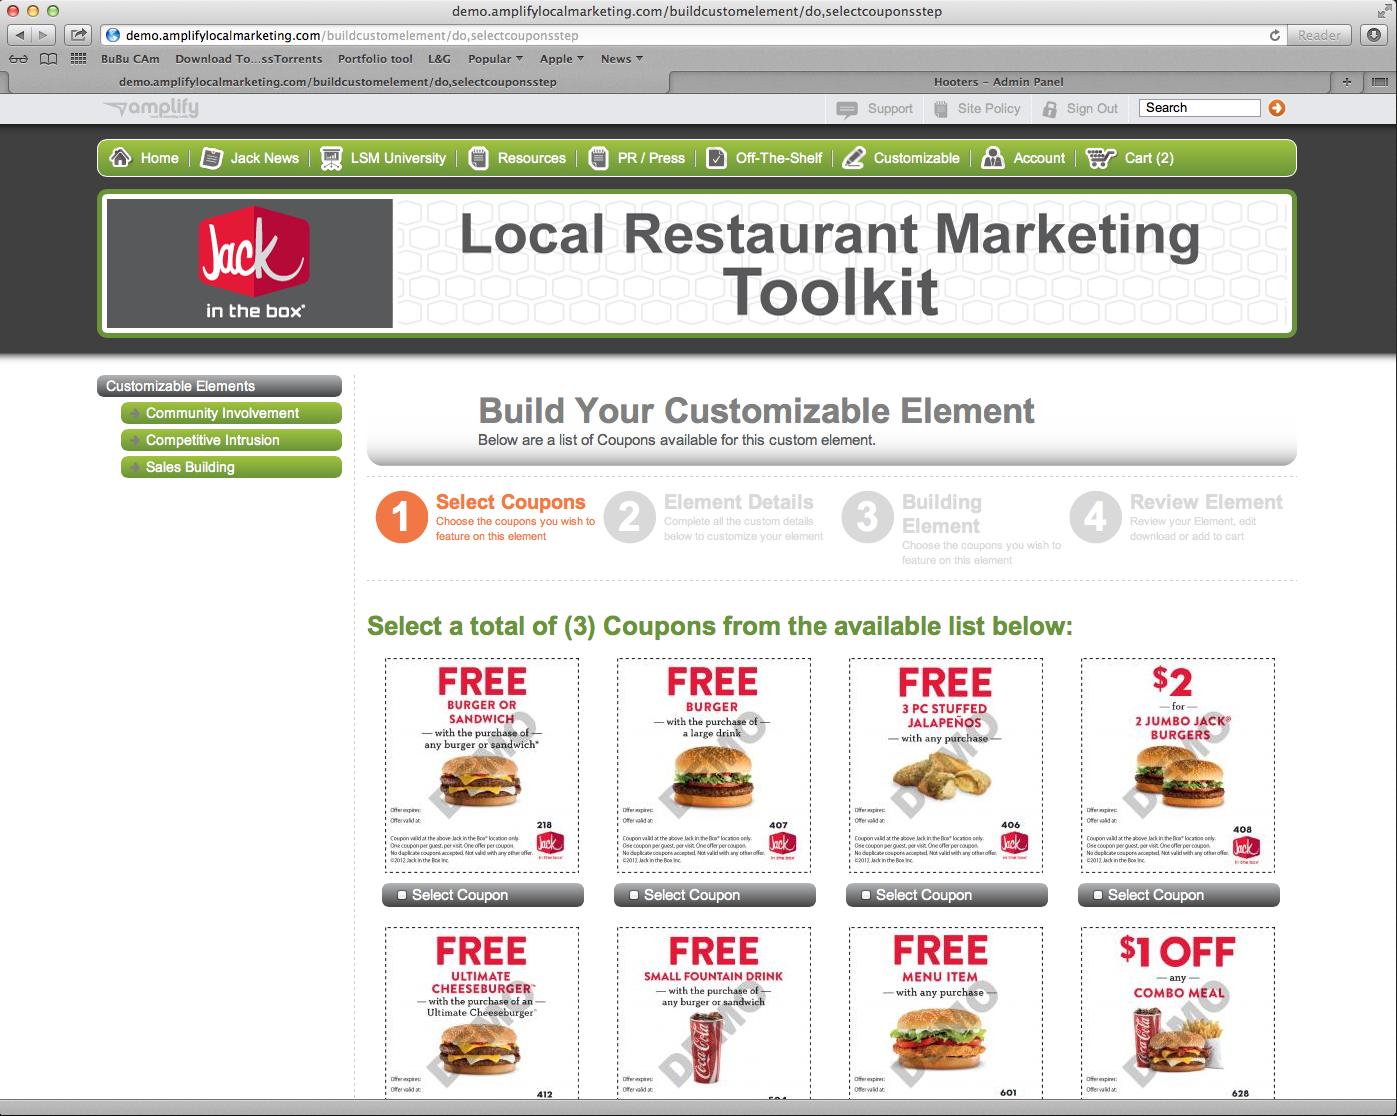 http://www.amplifylocalmarketing.com/wp-content/uploads/2013/02/Screen-Shot-2013-02-12-at-4.49.27-PM.png